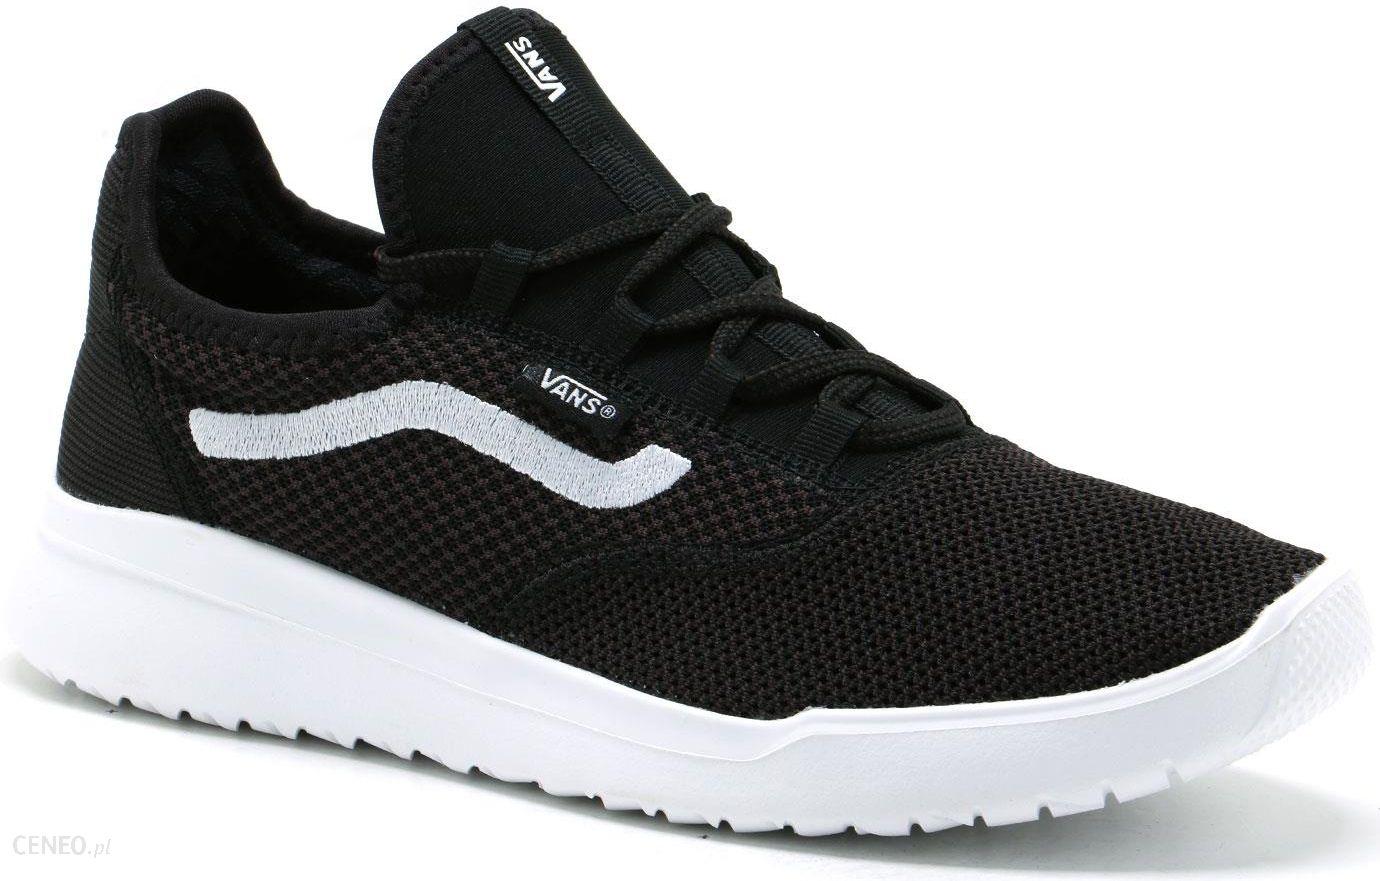 Sneakersy VANS CERUS LITE VA3MWBISJ Ceny i opinie Ceneo.pl